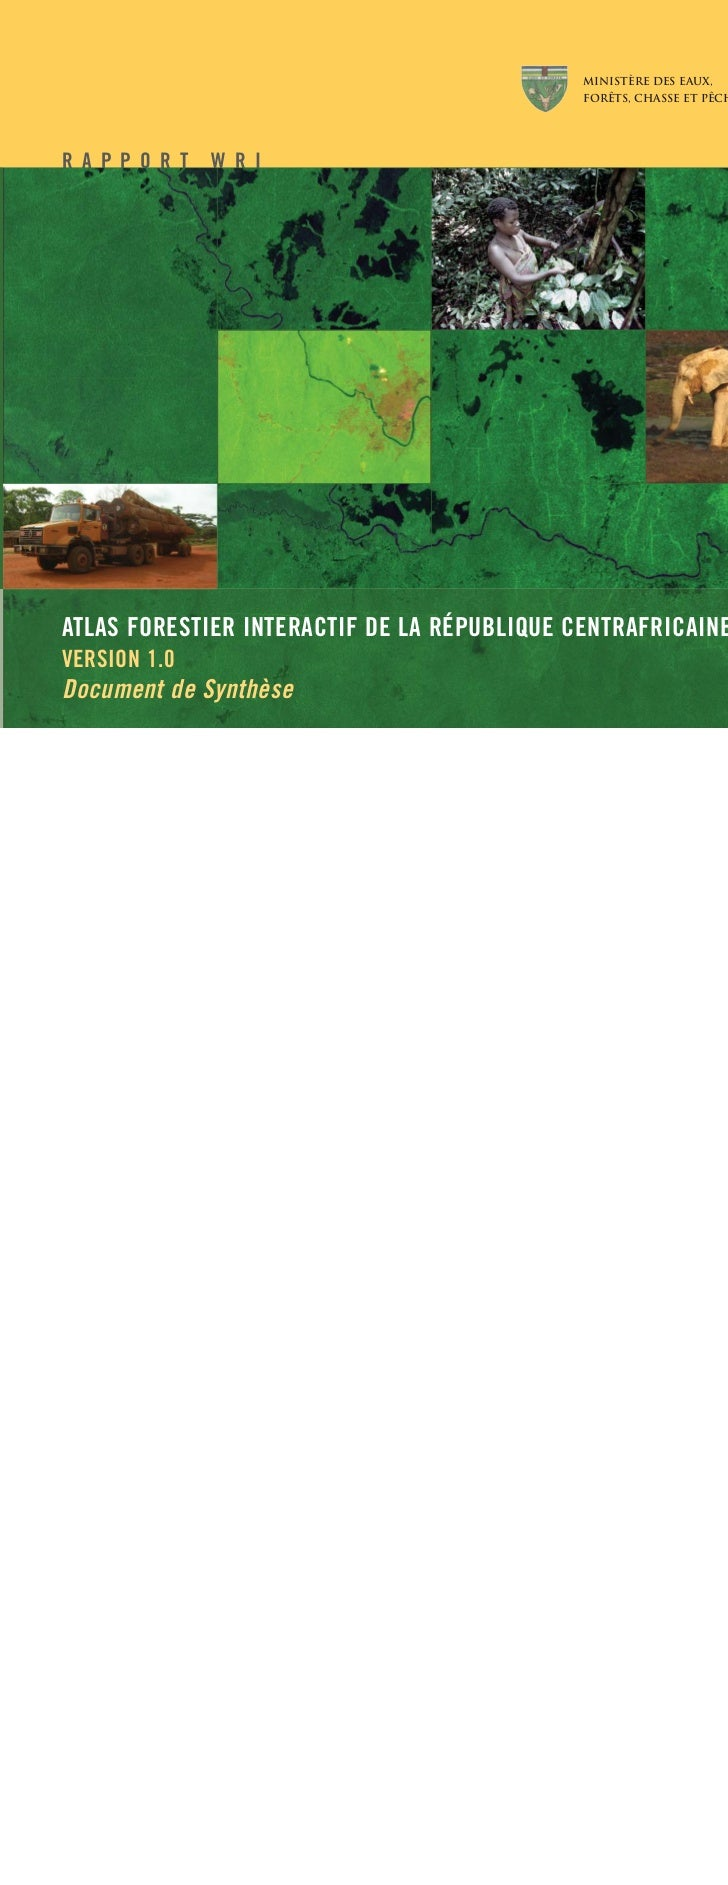 ATLAS FORESTIER INTERACTIF DE LA R�PUBLIQUE CENTRAFRICAINE